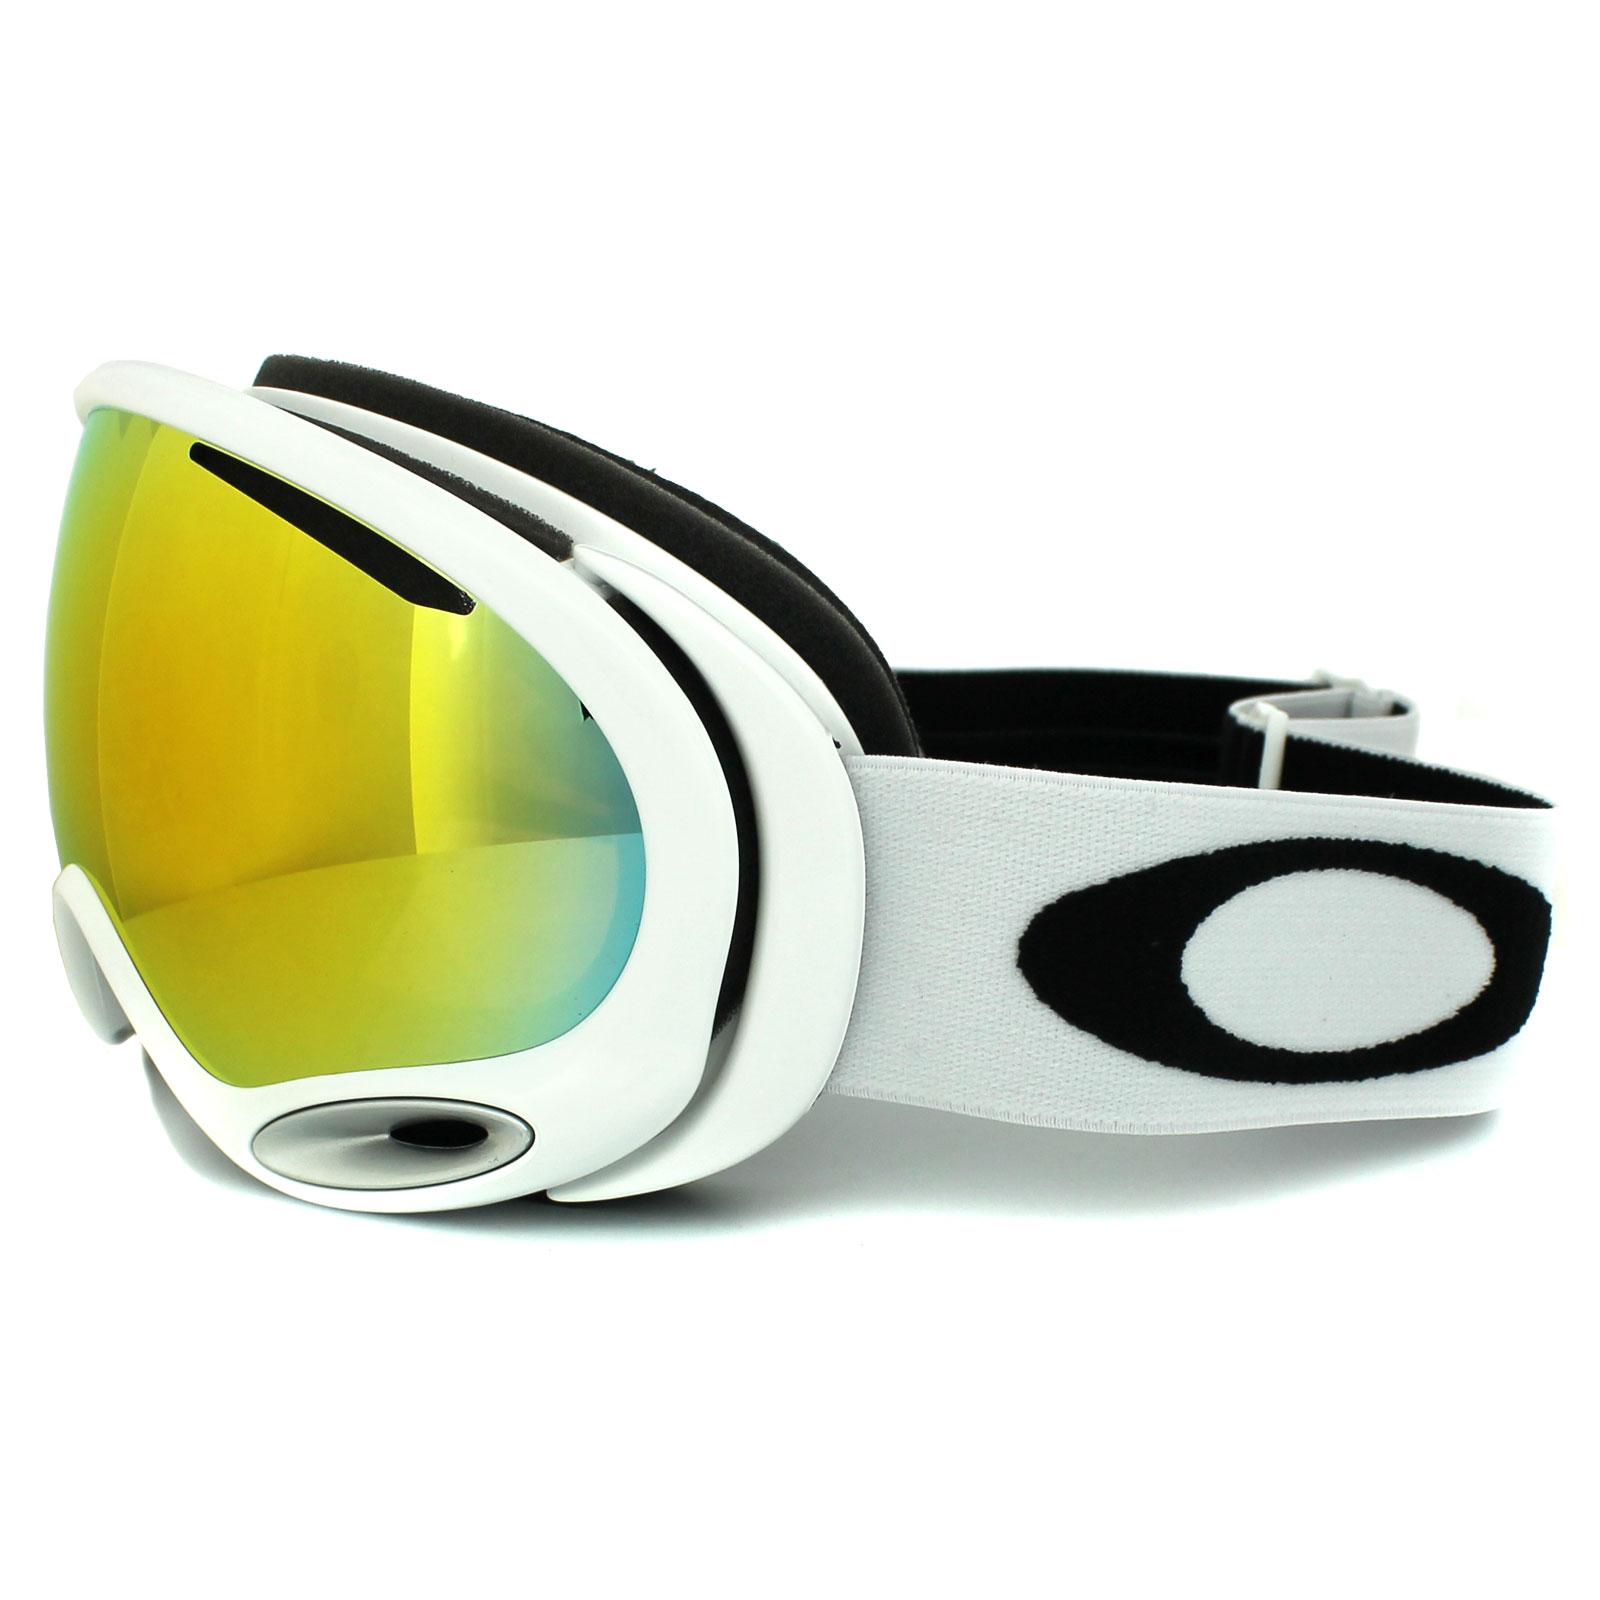 Wts33ujygypfazp Oakley Goggles Sunglasses